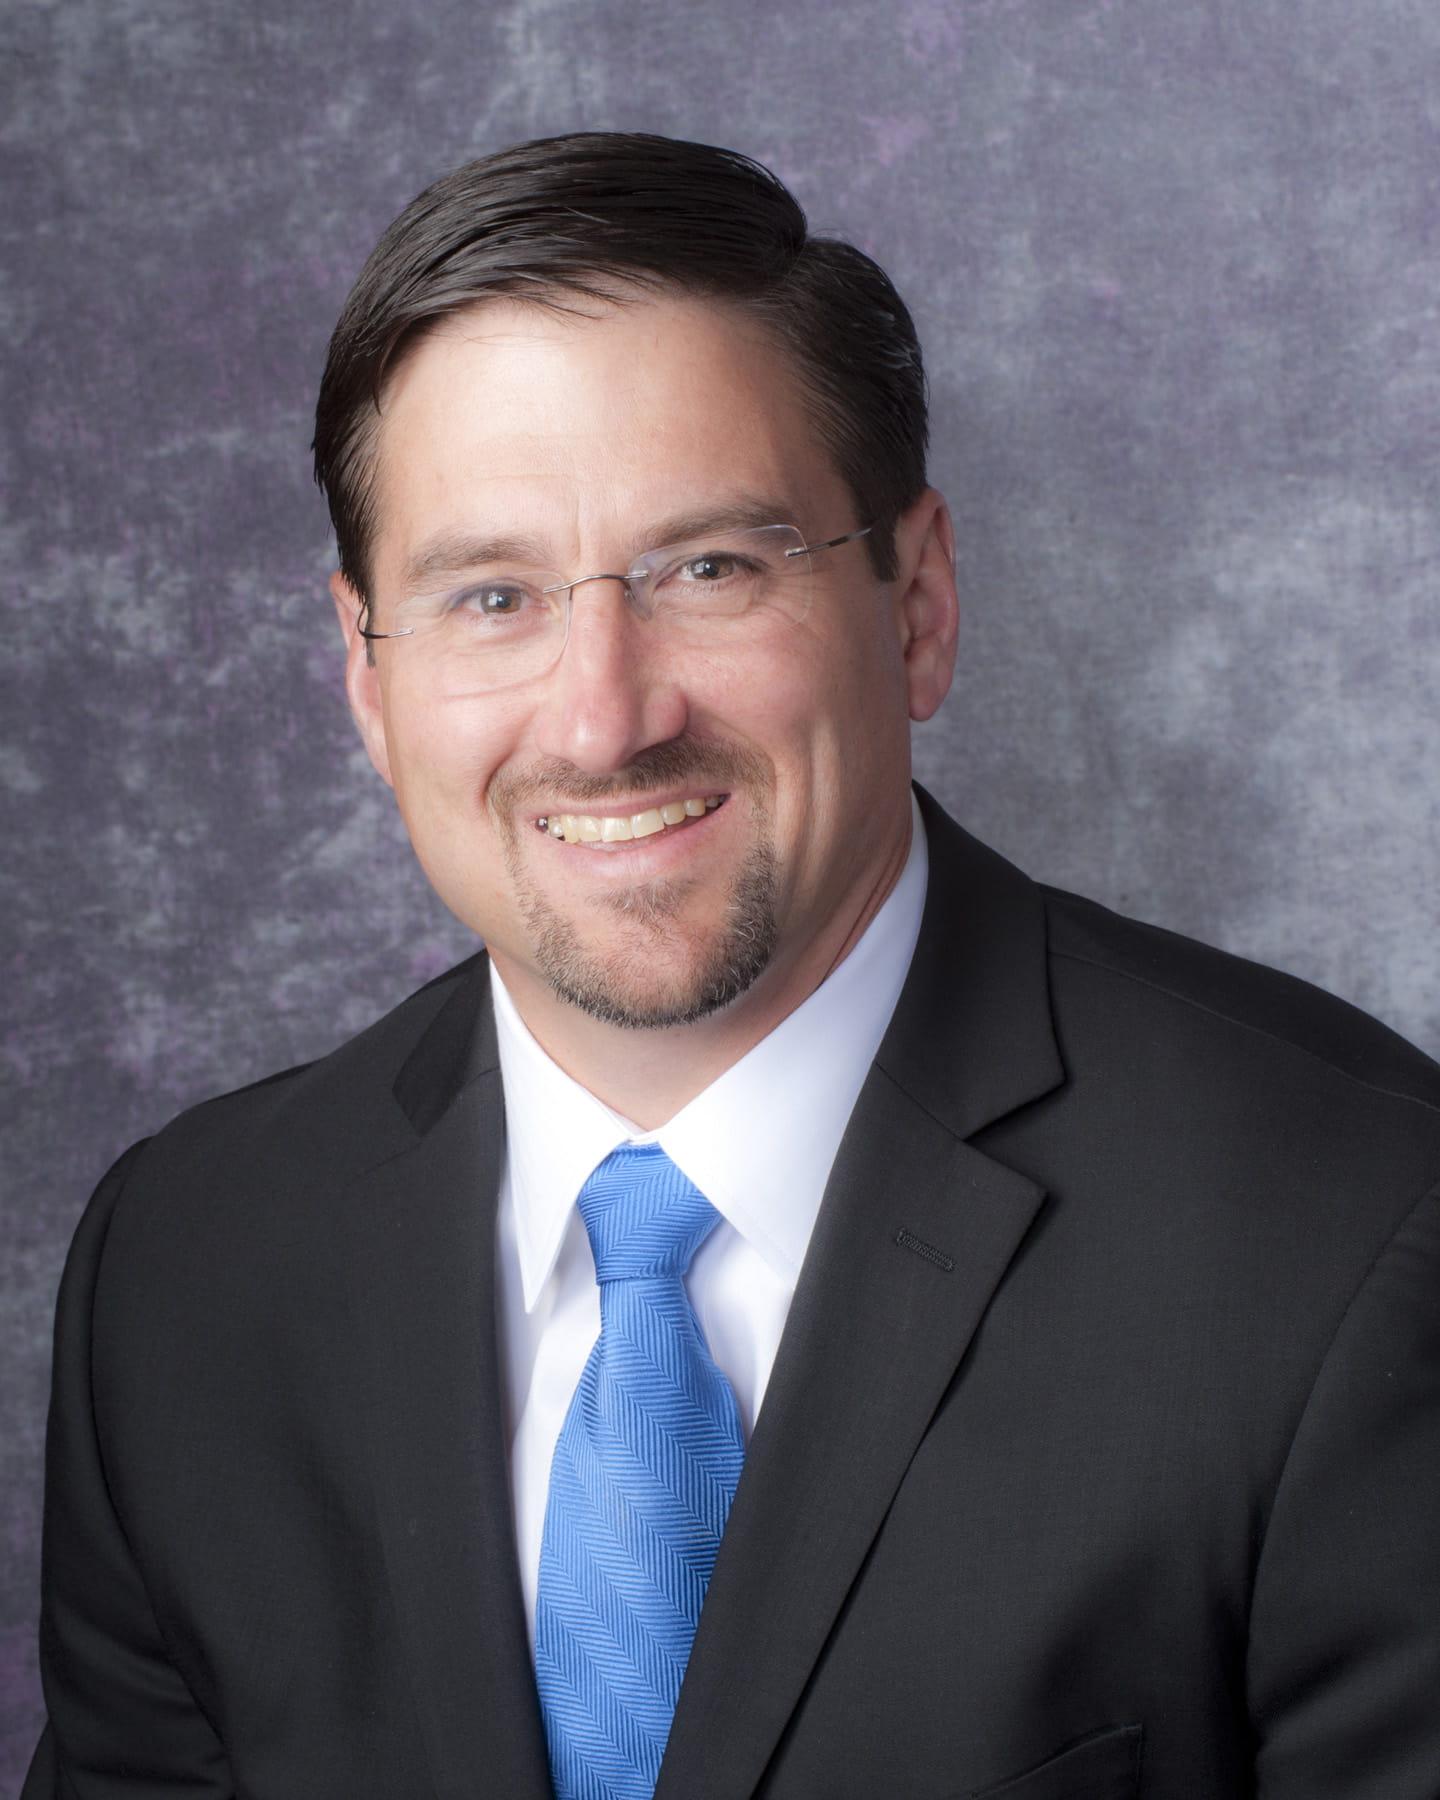 Christopher A. Gessner, President, Children's Hospital of Pittsburgh of UPMC